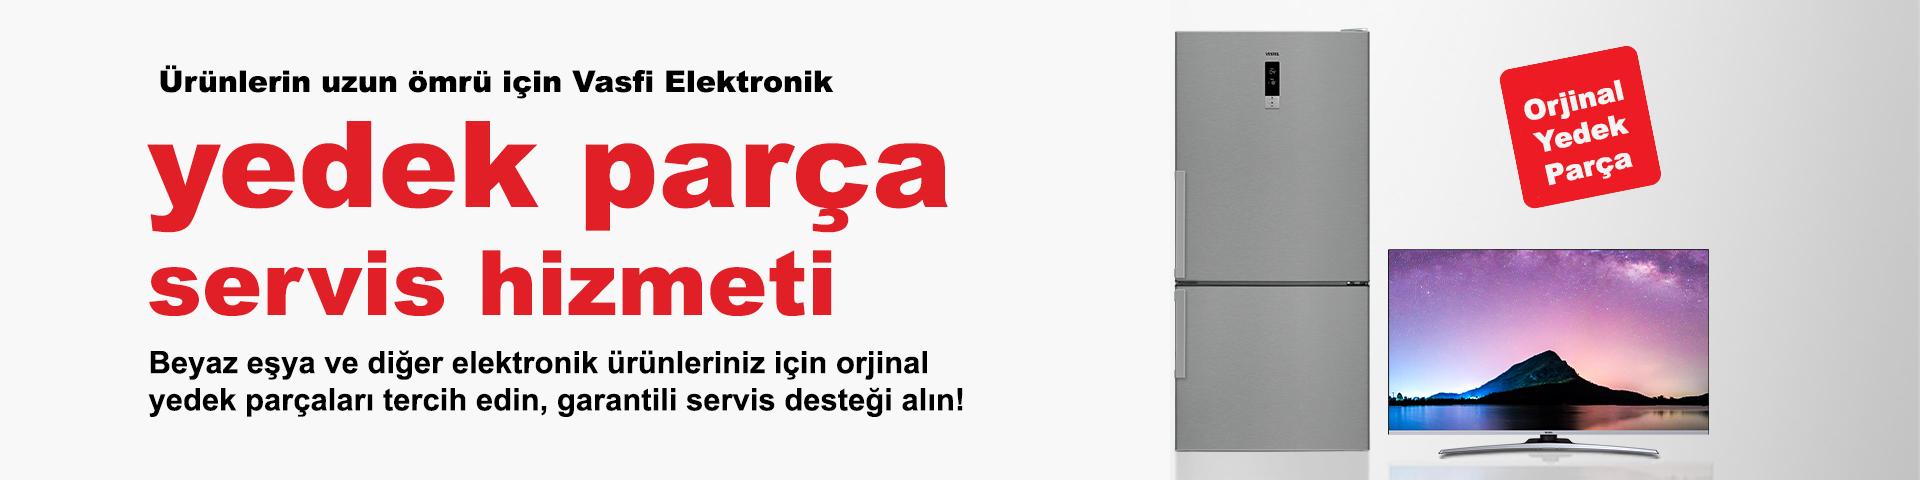   Vasfi Elektronik   0312 442 88 88   Ankara Yetkili Servis Merkezi  